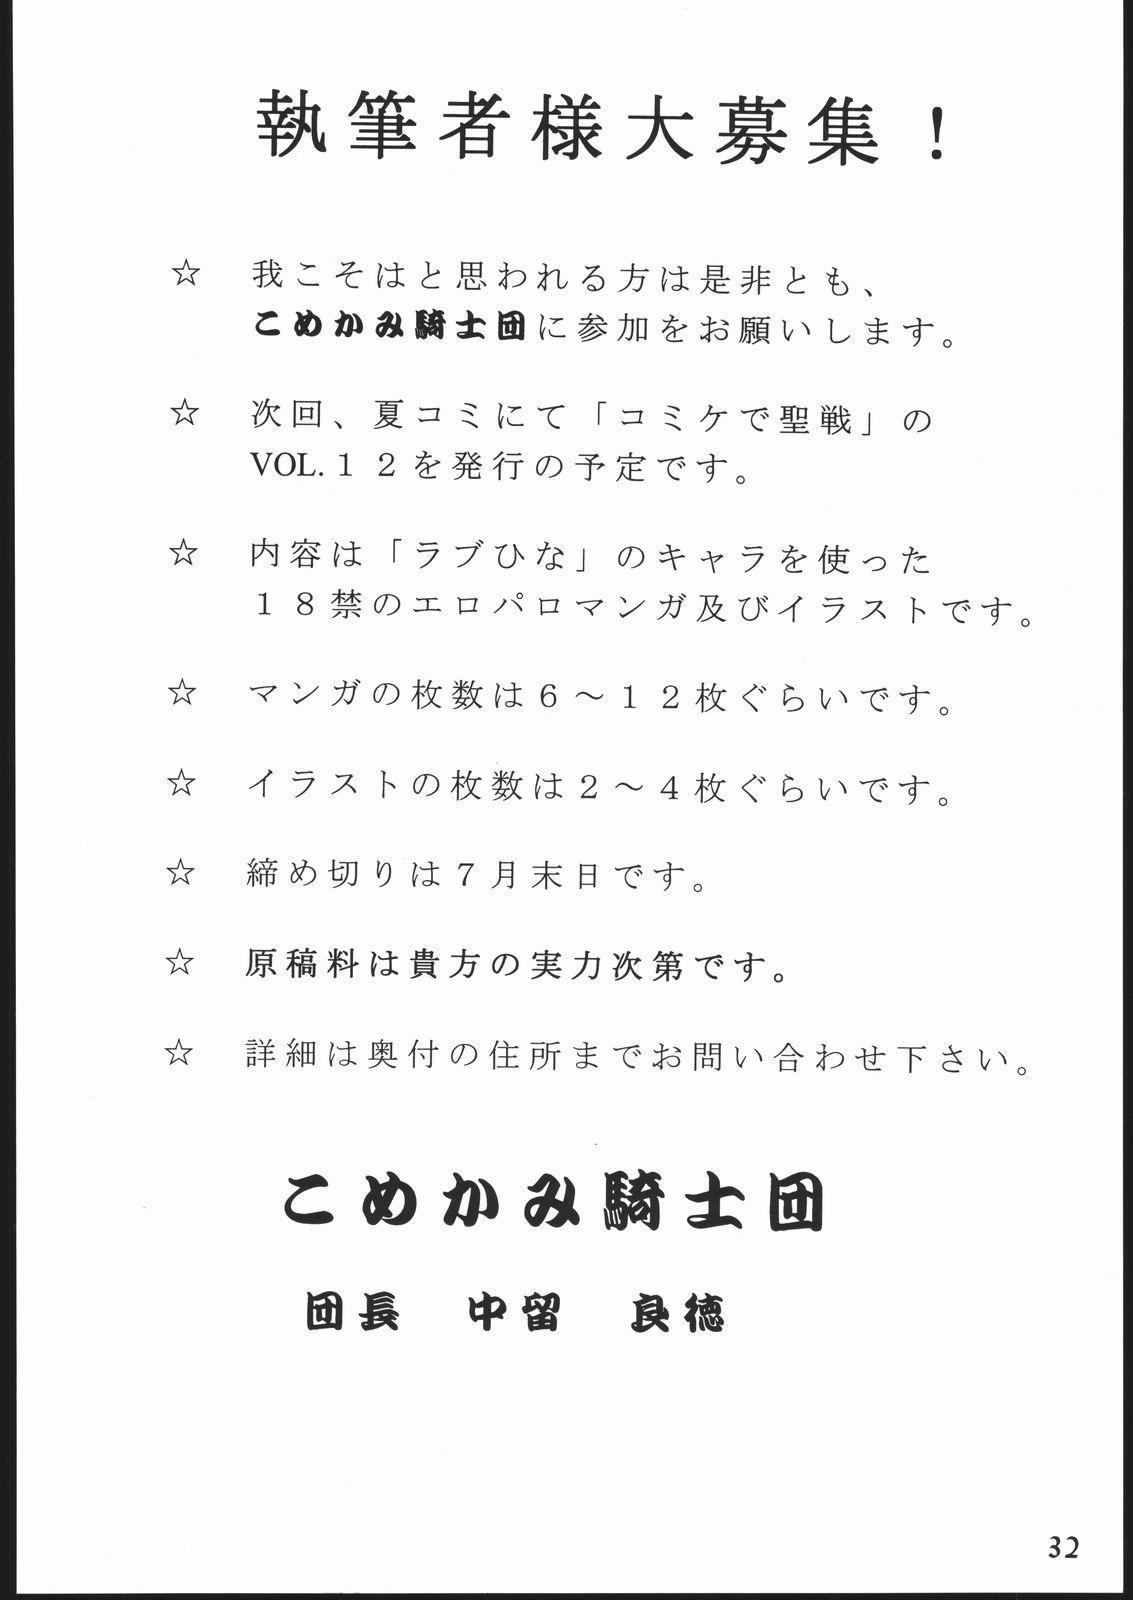 Kakumei Seisen Dai Go Gou 30